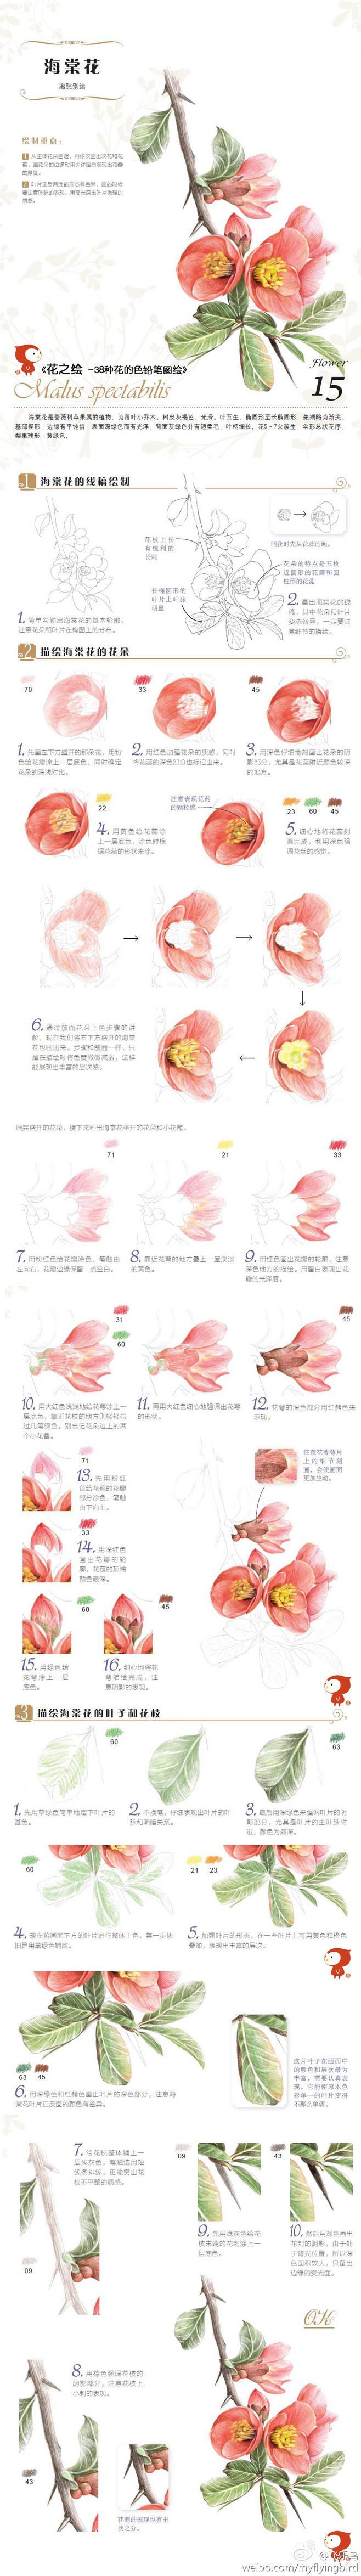 @❤❤Joyce❤❤采集到彩铅(36图)_花瓣插画